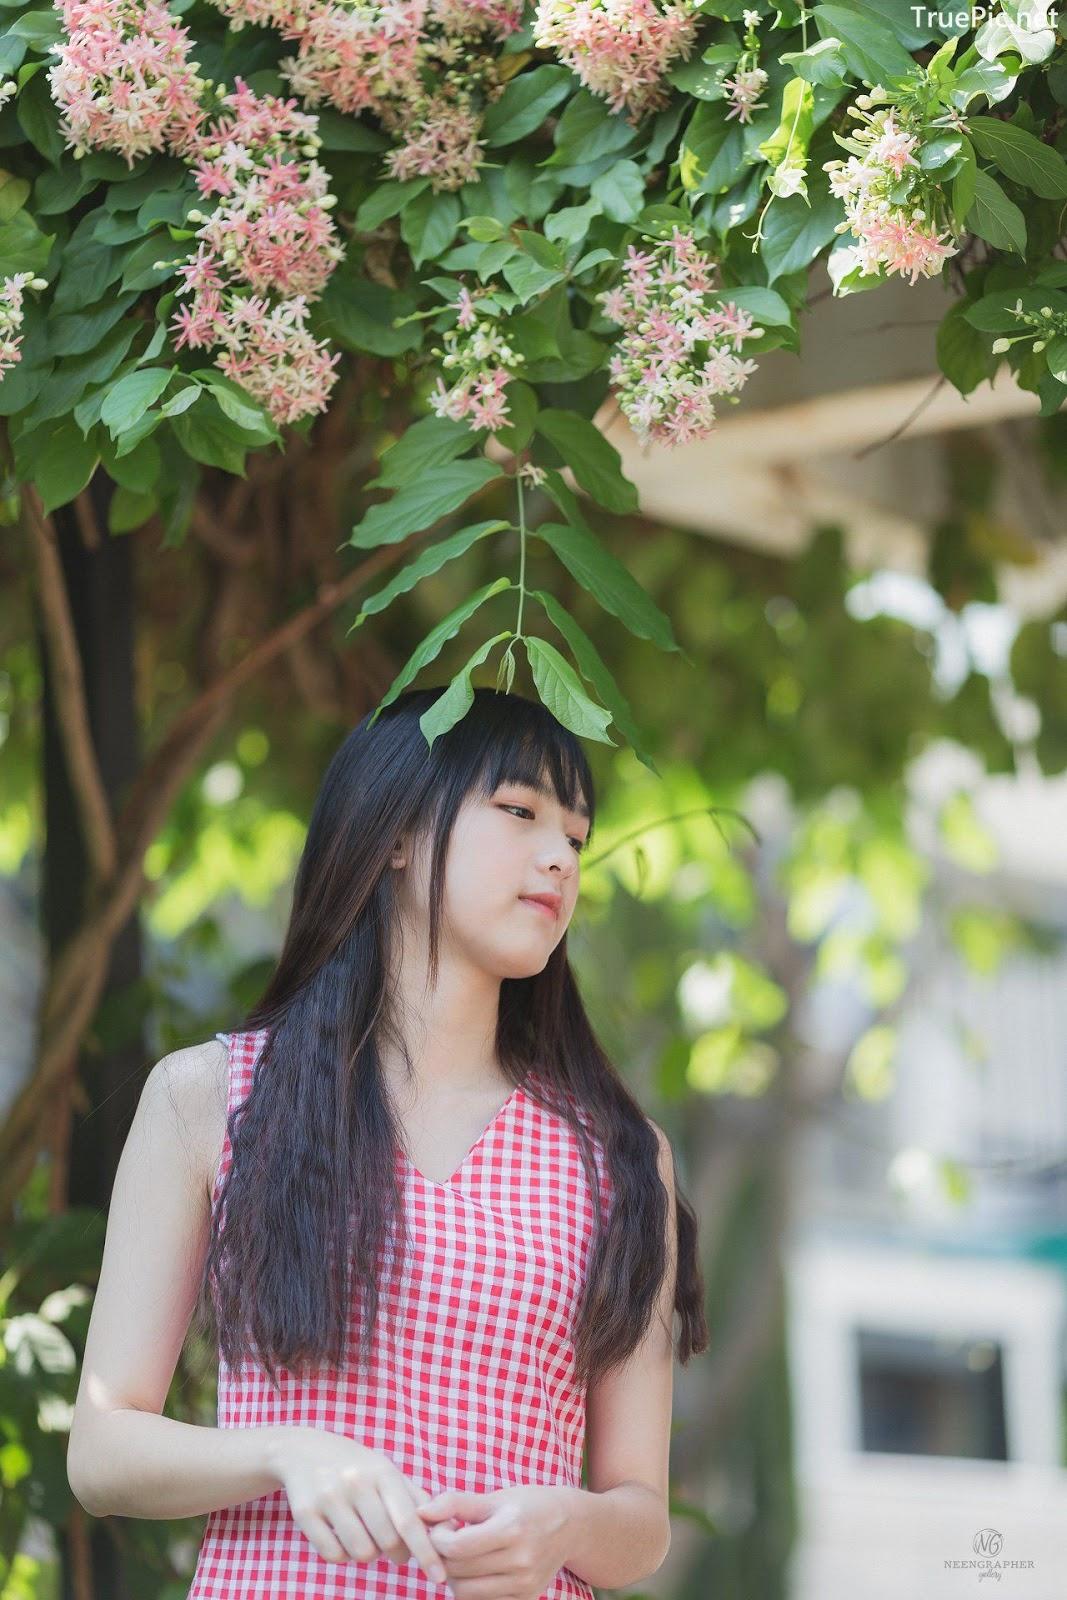 Image-Thailand-Cute-Model-Emma-Panisara–Album-Emma-Bright-Sunday-TruePic.net- Picture-7